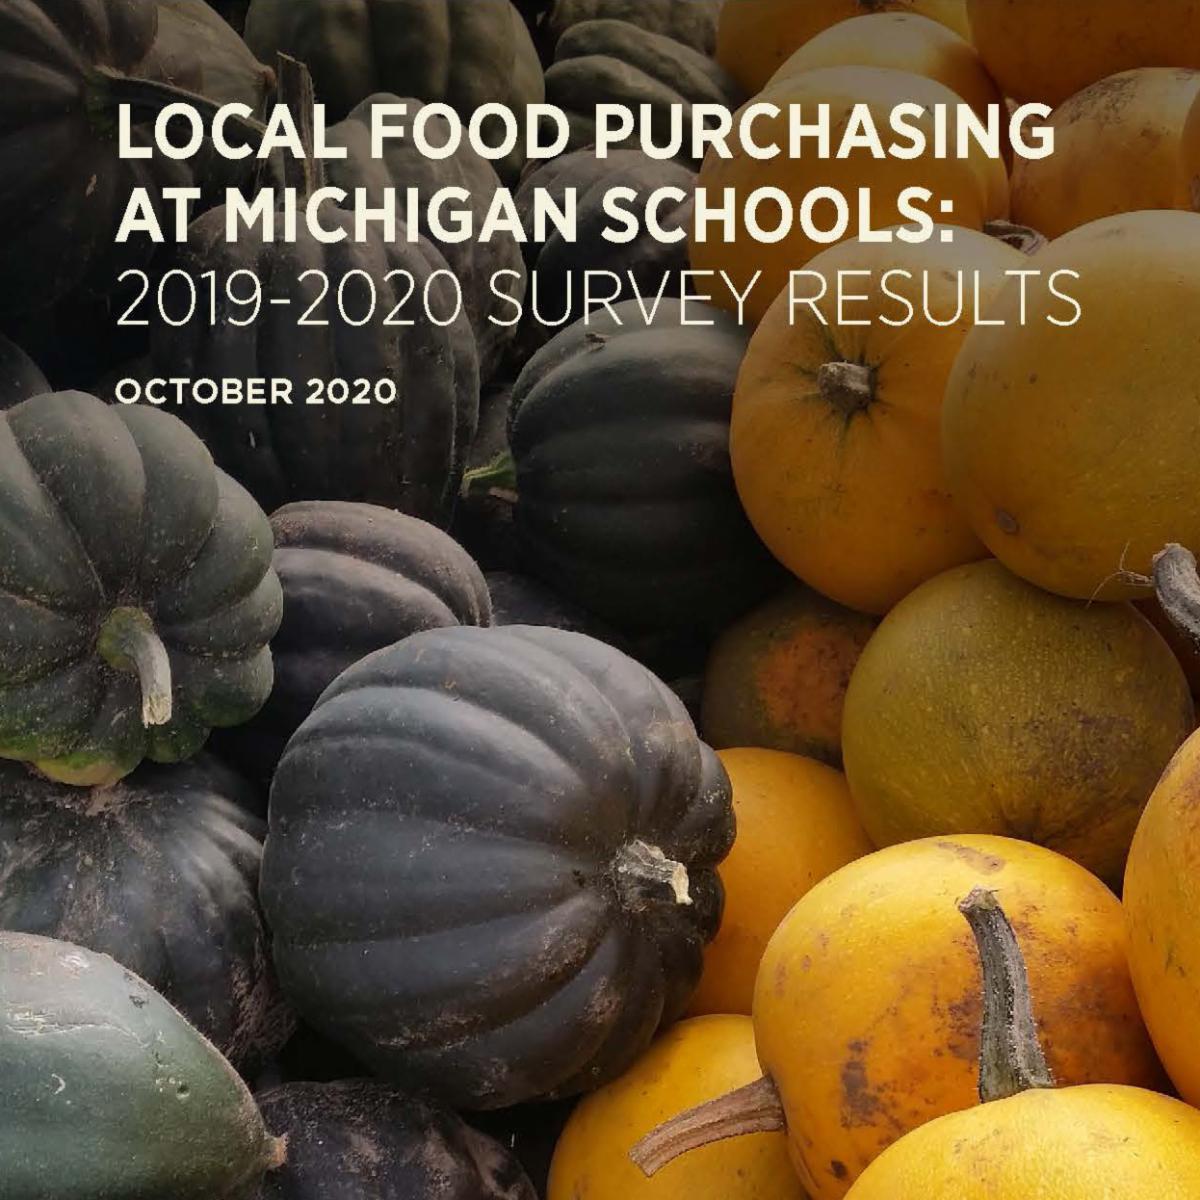 Local Food Purchasing at Michigan Schools: 2019-2020 Survey Results